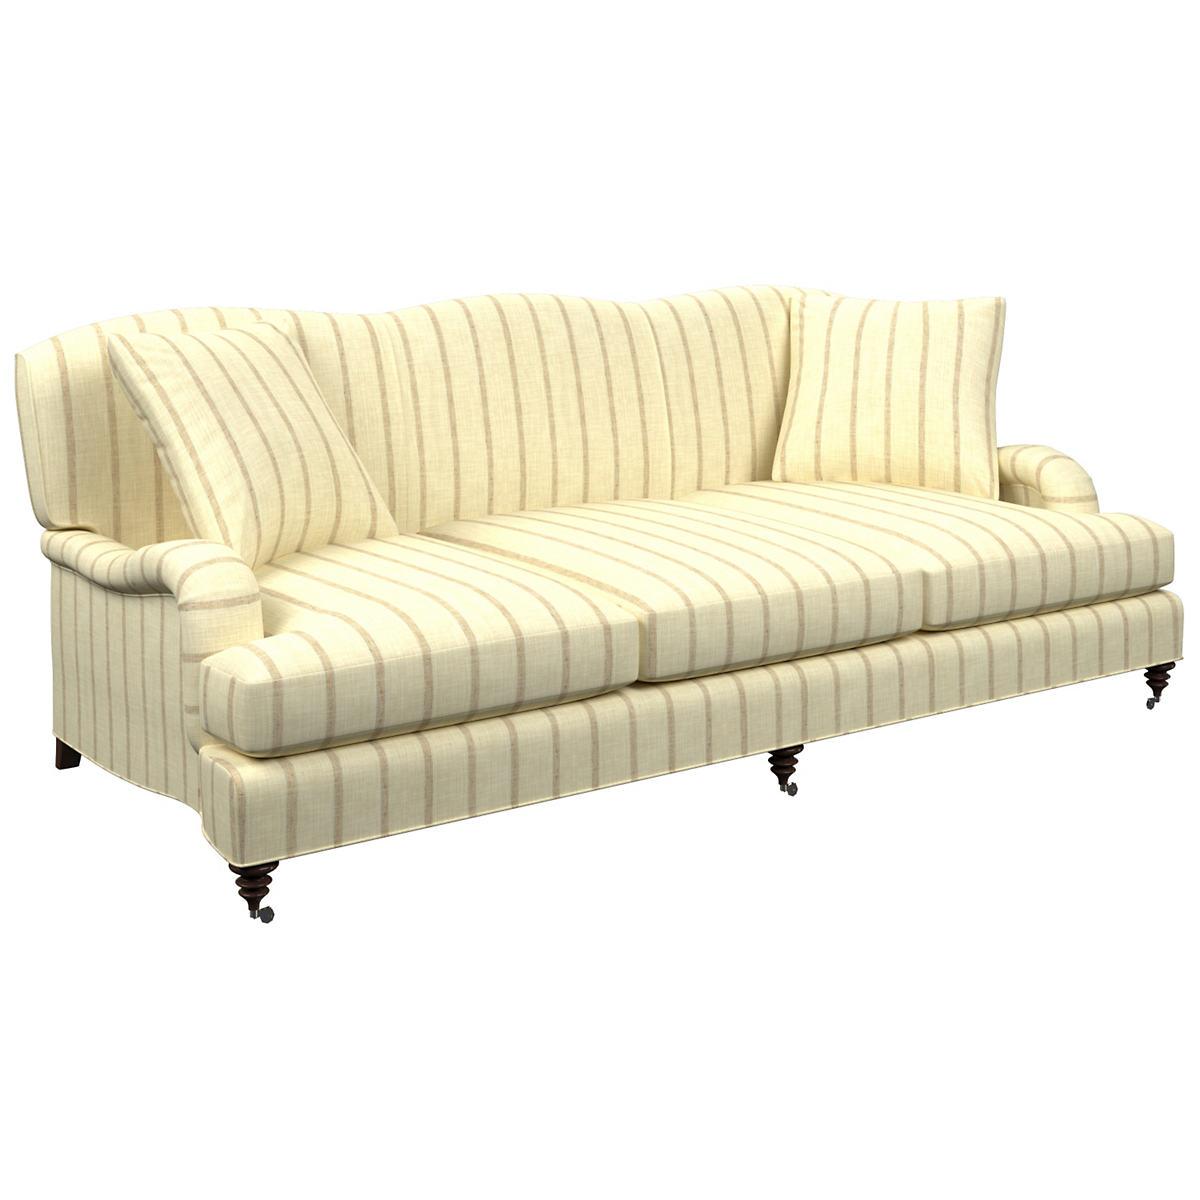 Glendale Stripe Natural/Grey Litchfield 3 Seater Sofa